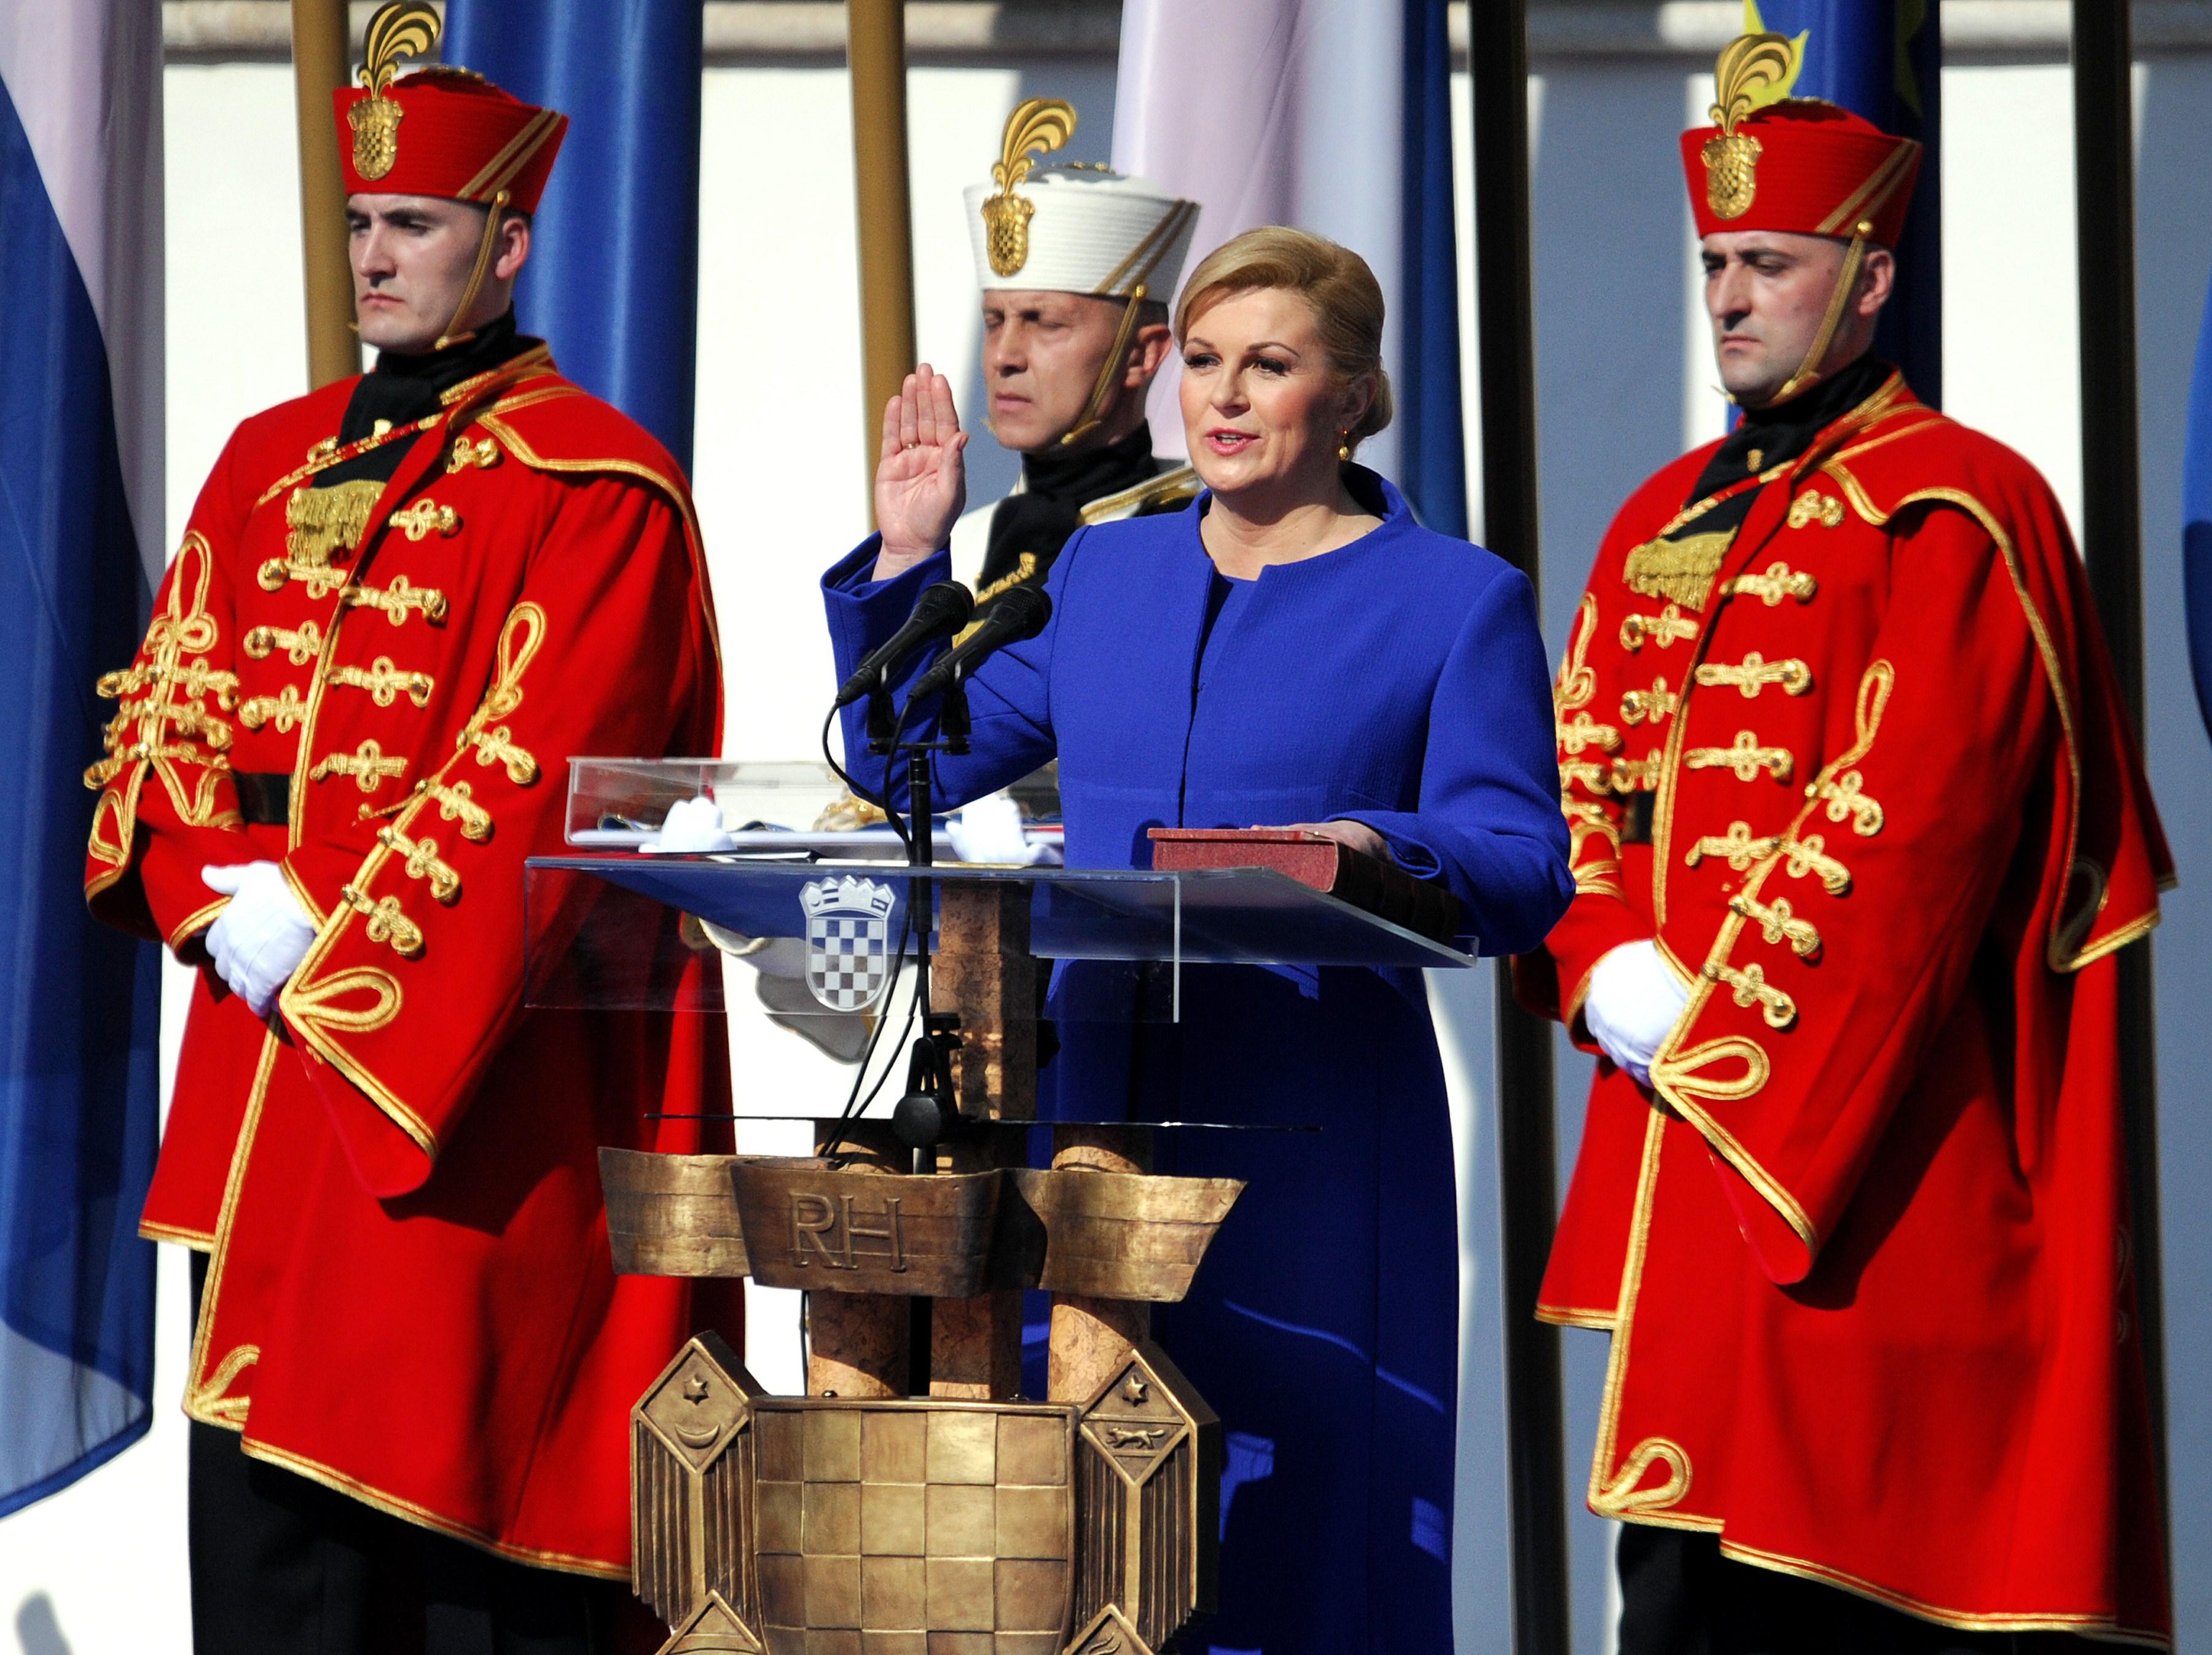 Swearing in of Croatia's President Kolinda Grabar-Kitarovic